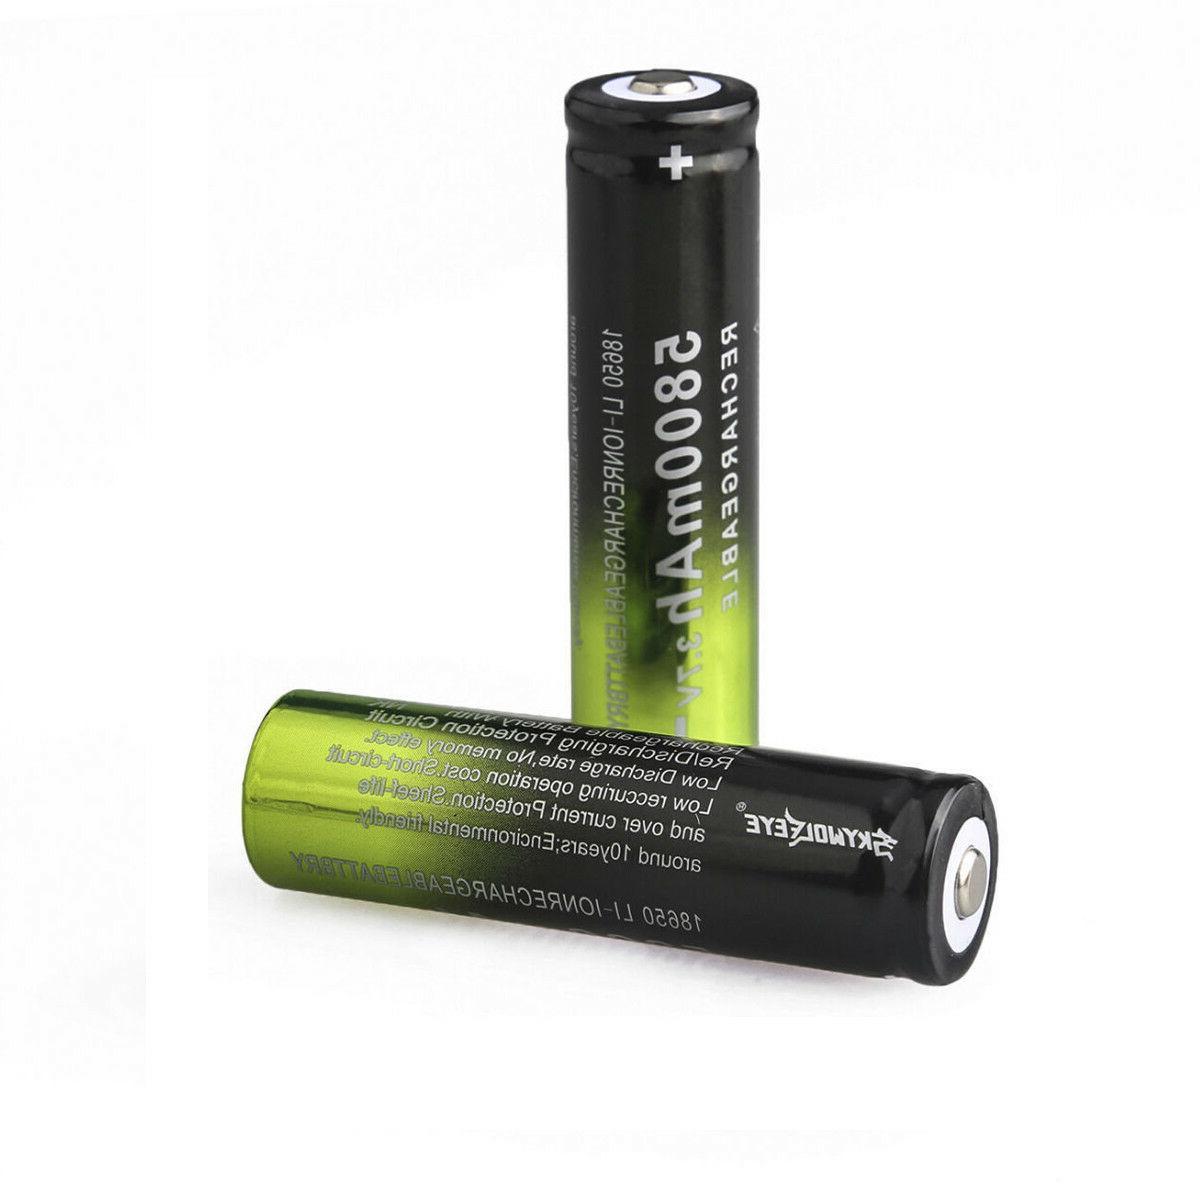 USA 18650 Battery 3.7V Li-ion Intelligent